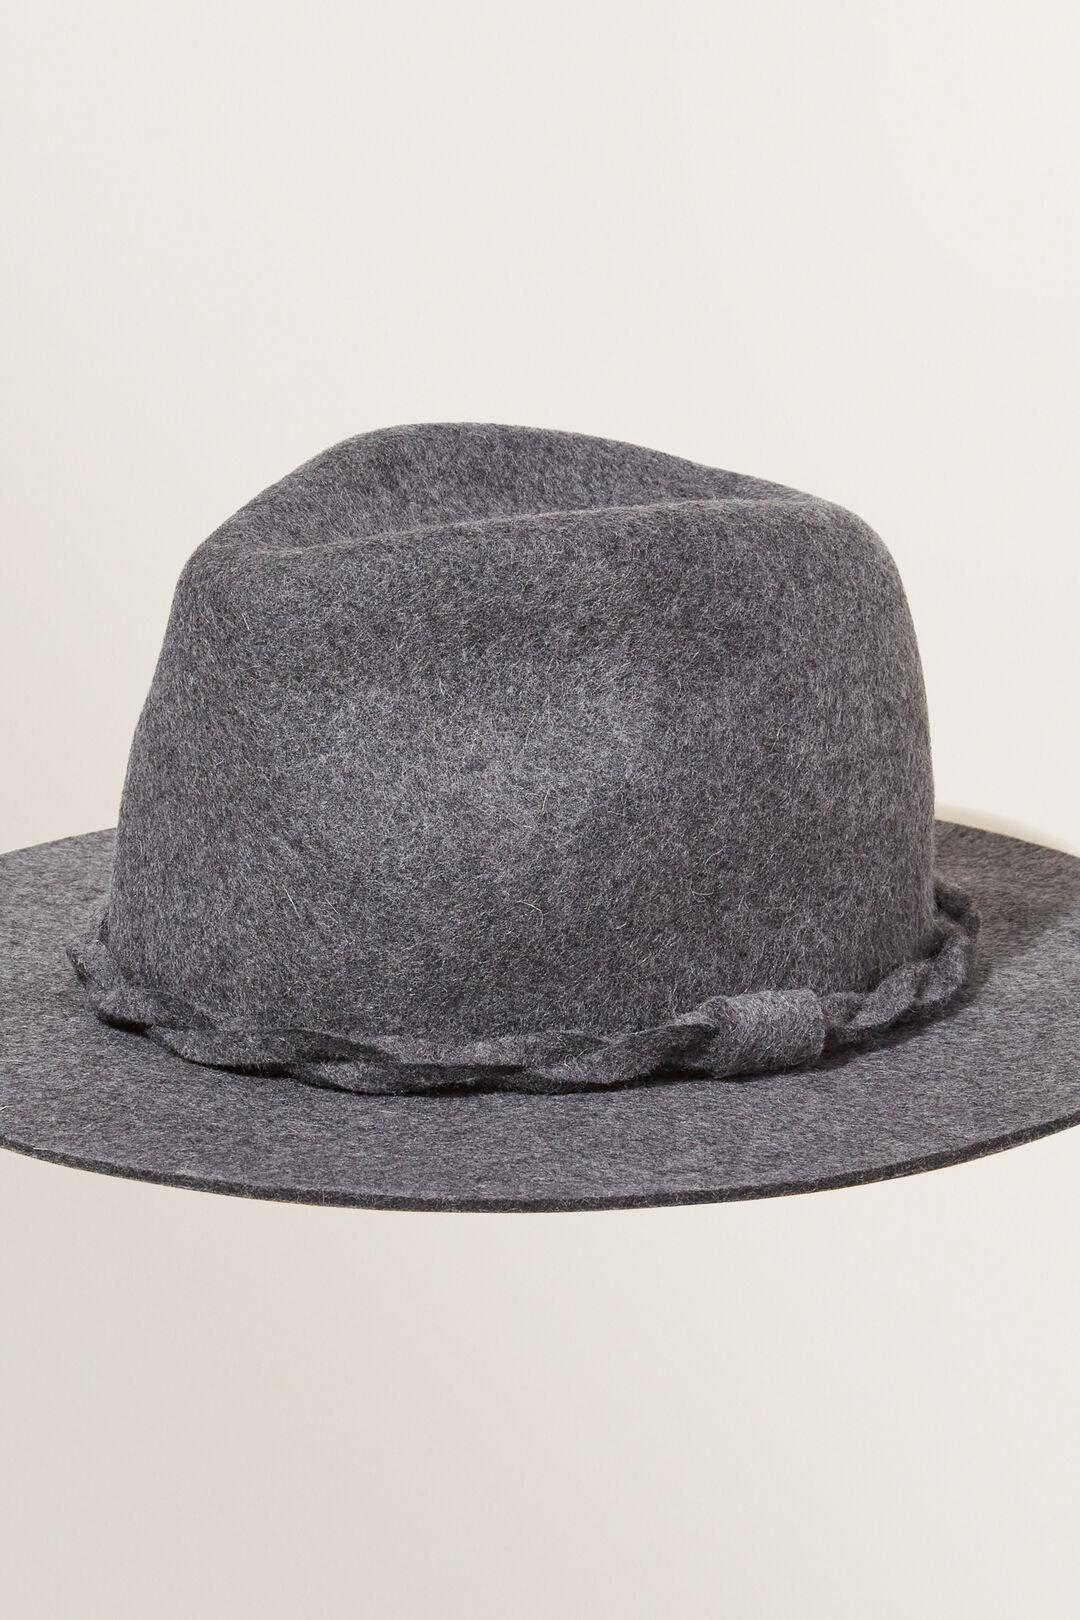 Wool Panama Hat  DARK GREY MARLE  hi-res